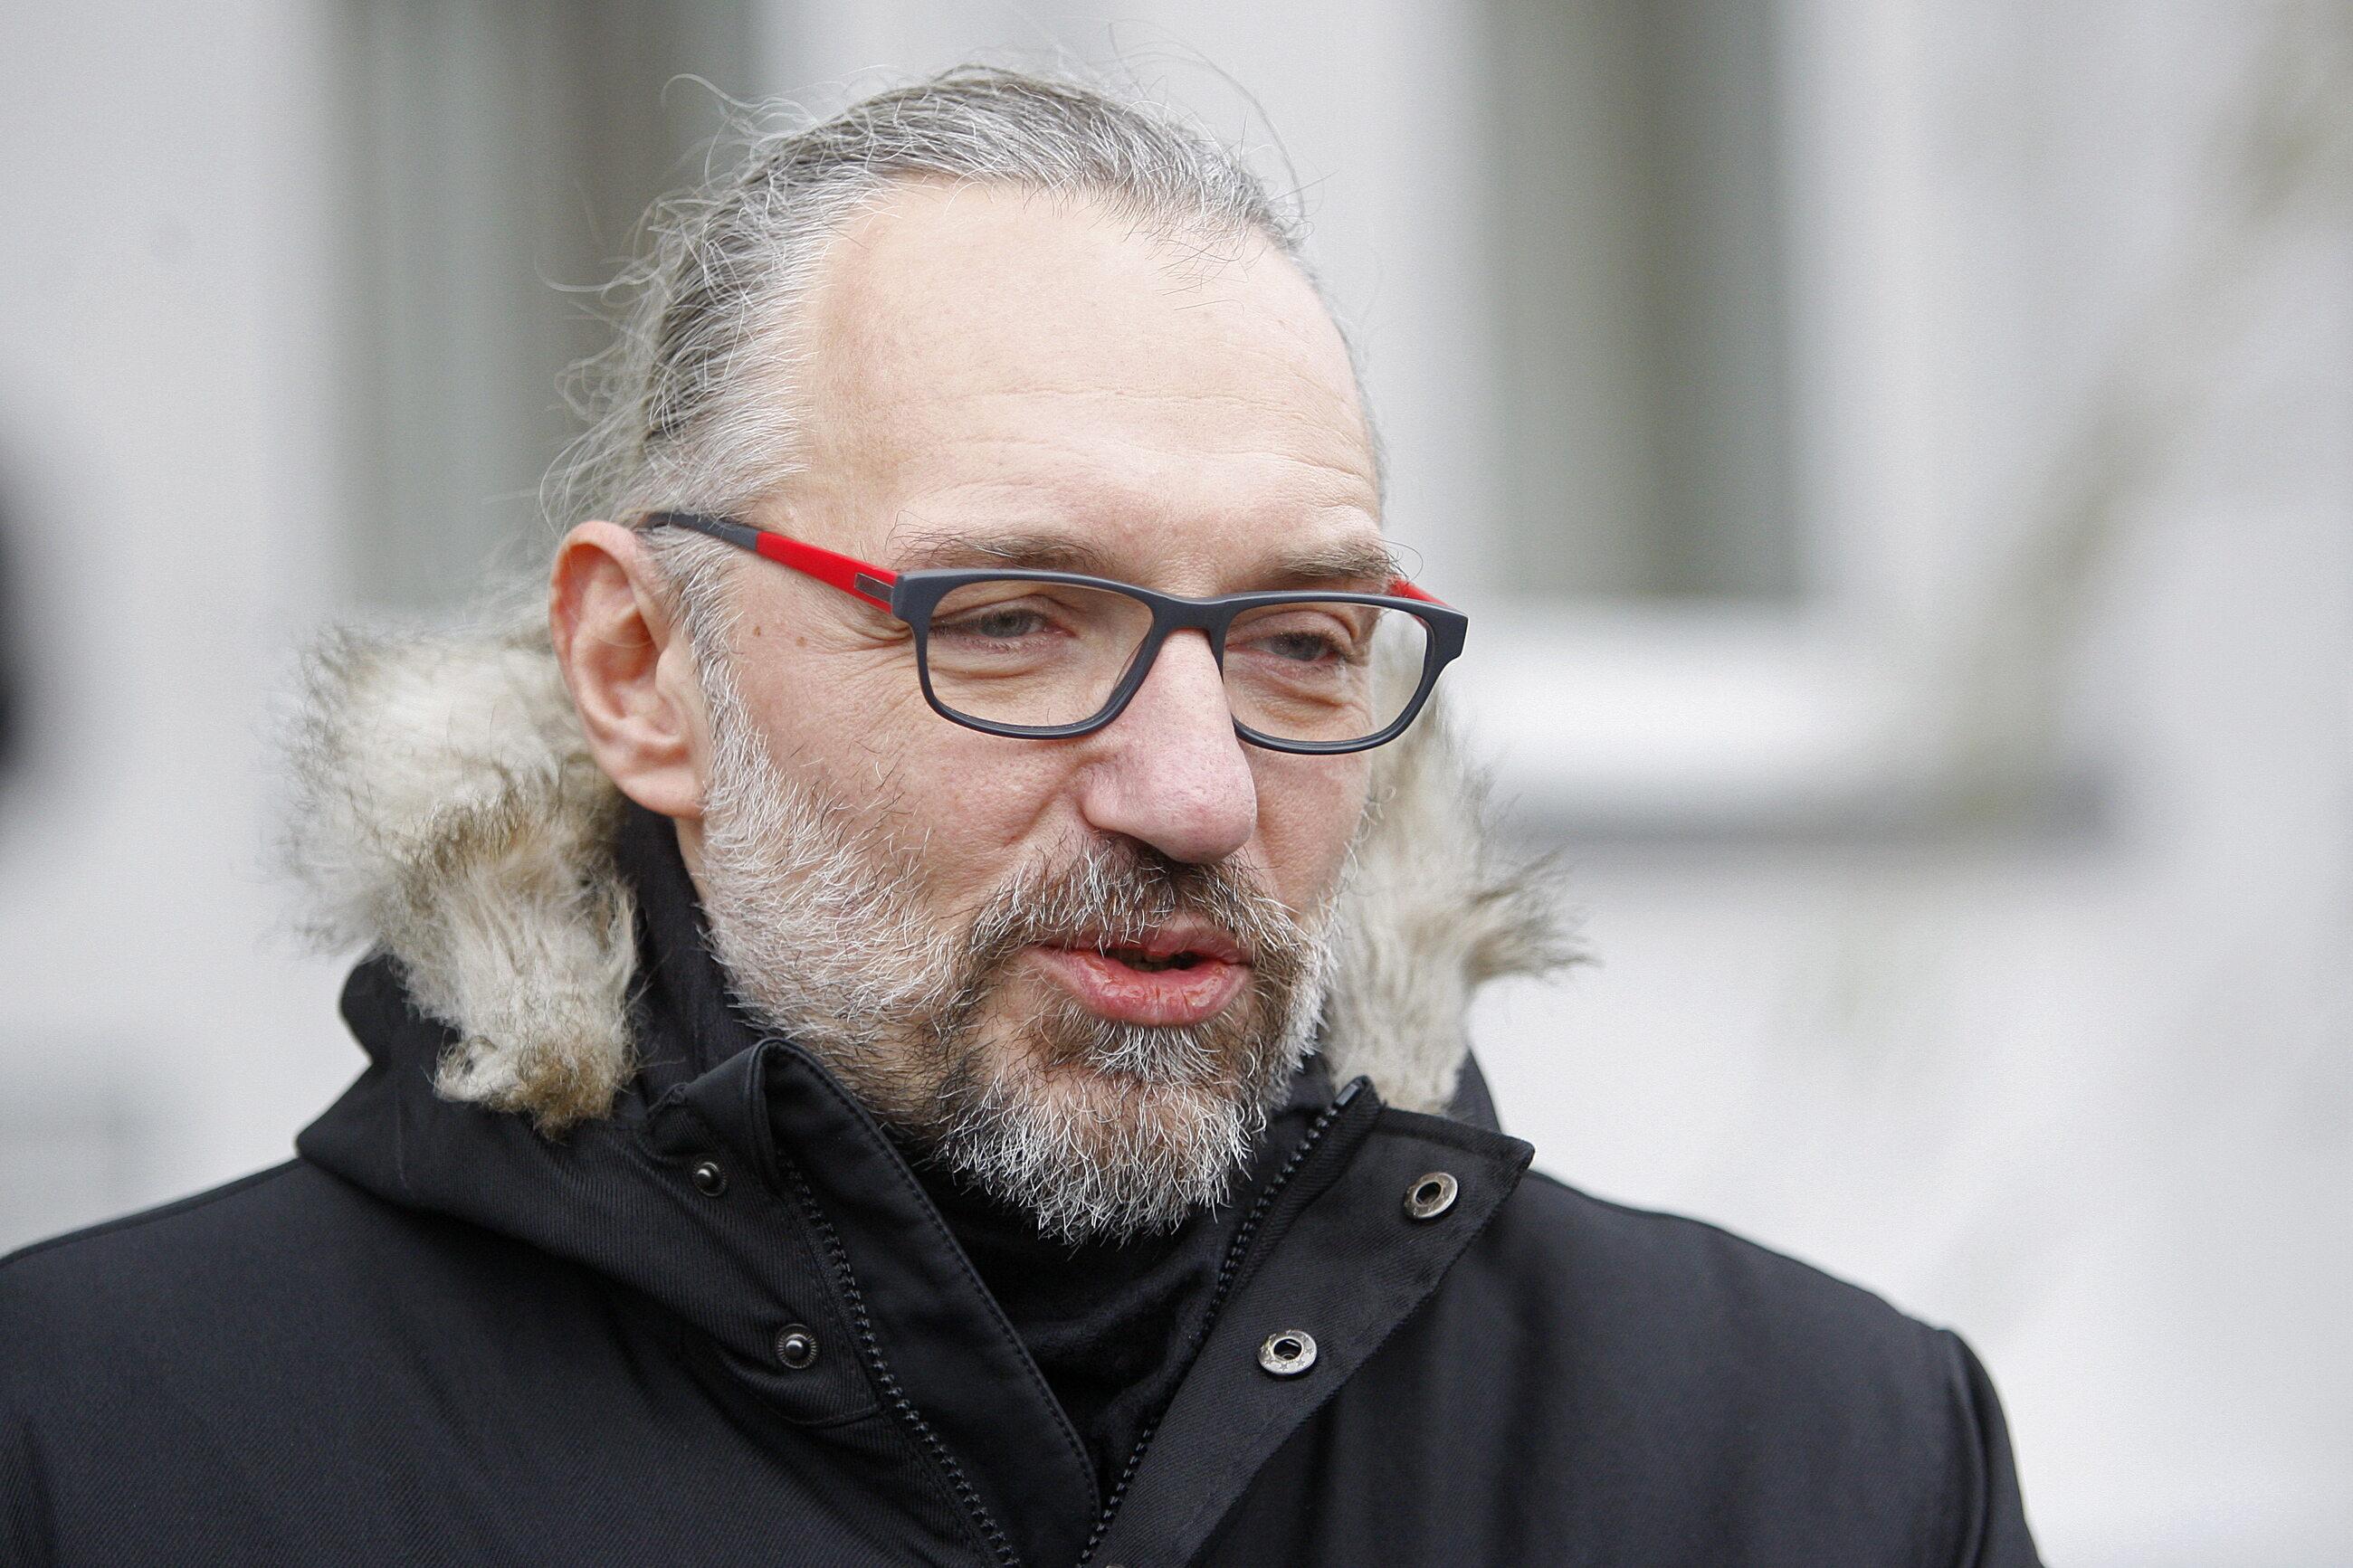 Mateusz Kijowski, KOD